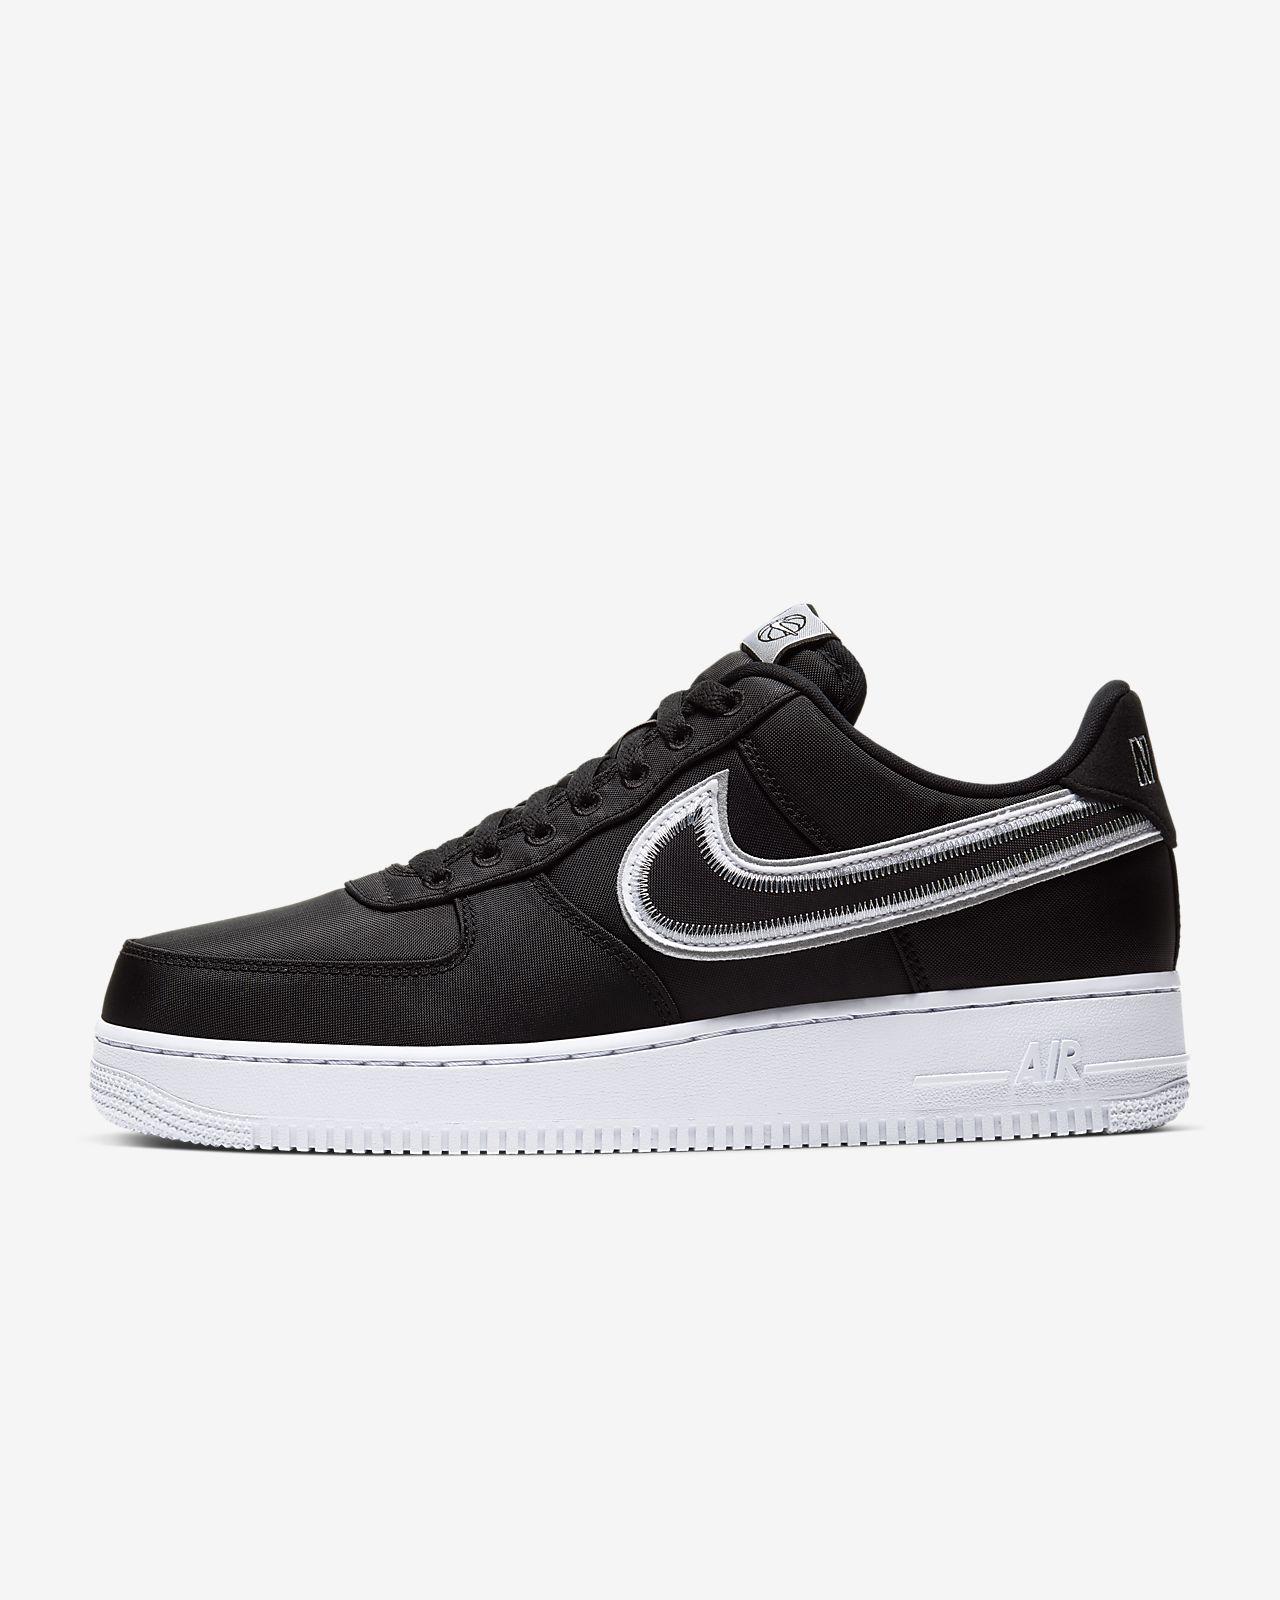 Nike Sportswear Sneakers laag 'Nike Air Force 1 '07 LV8 1